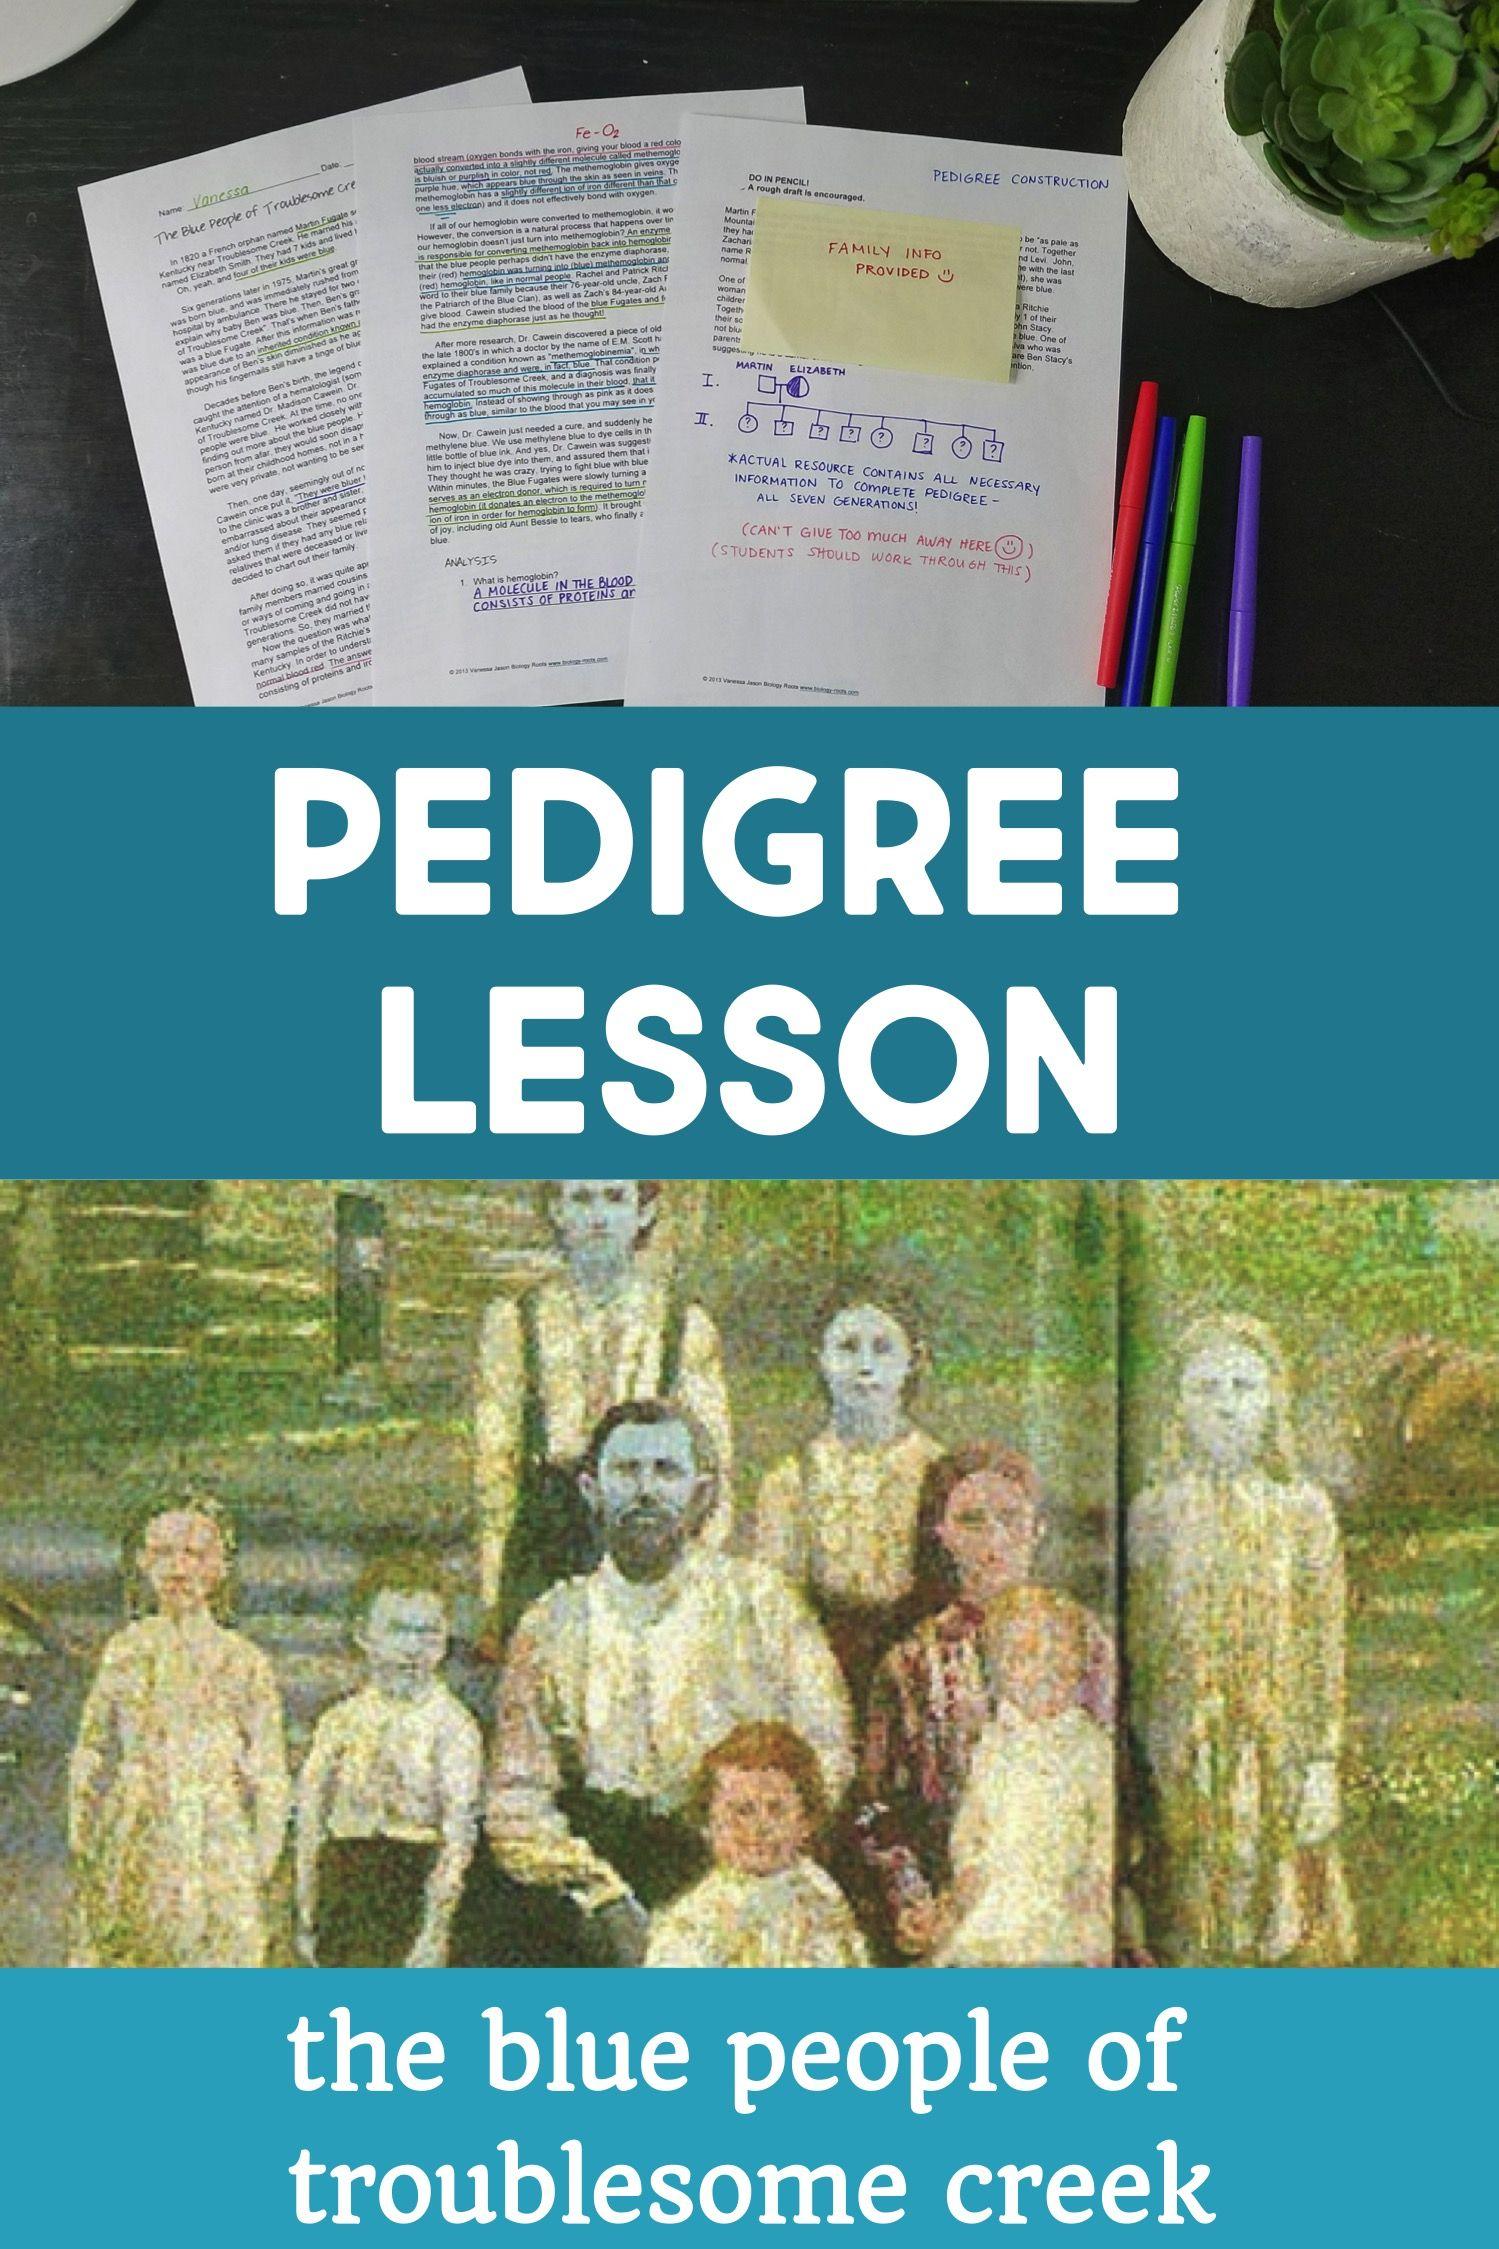 Pedigree Practice The Blue People Pedigree Activity